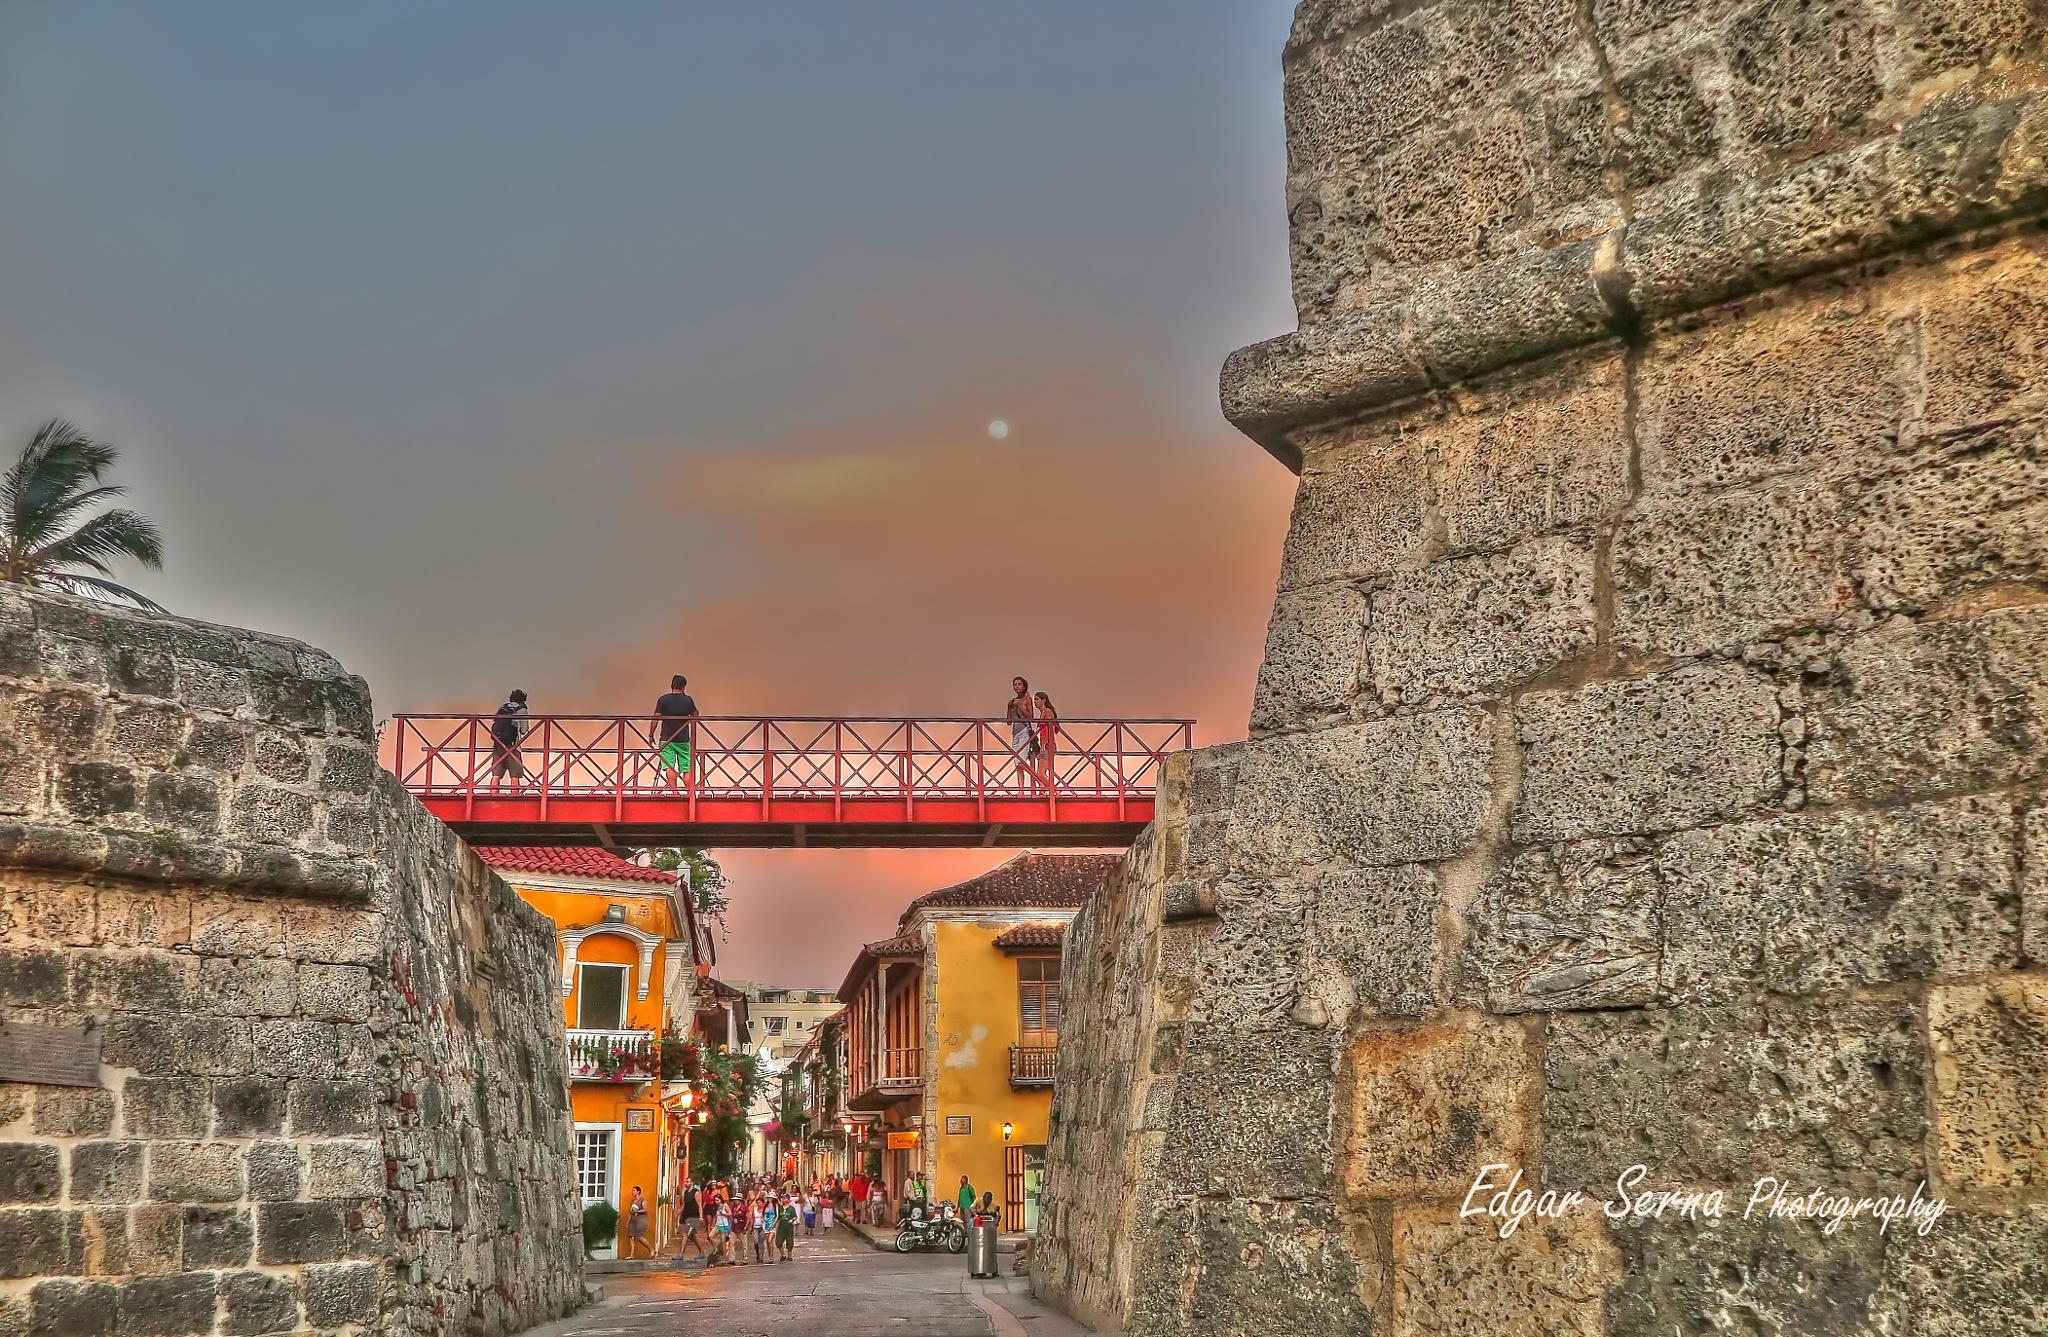 Cartagena, walled city by Edgar Serna